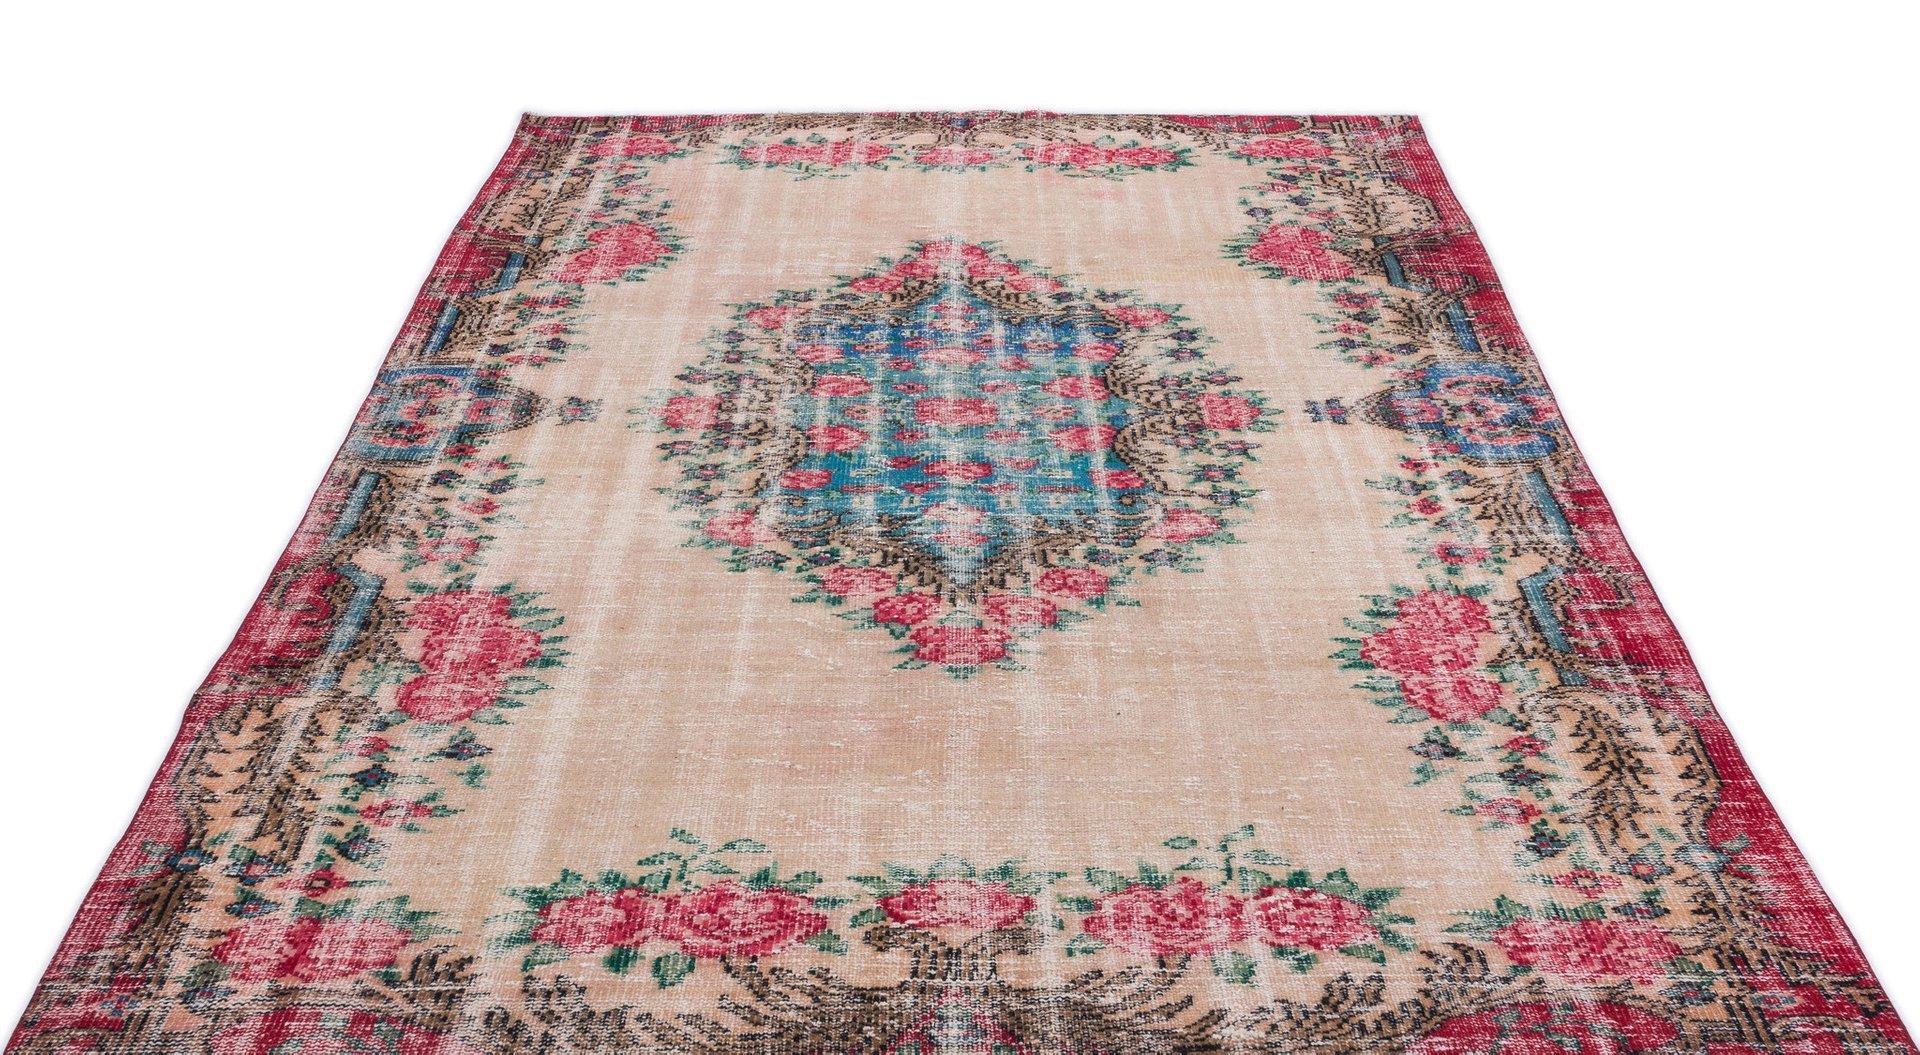 tapis vintage multicolore teint turquie 1960s en vente sur pamono. Black Bedroom Furniture Sets. Home Design Ideas